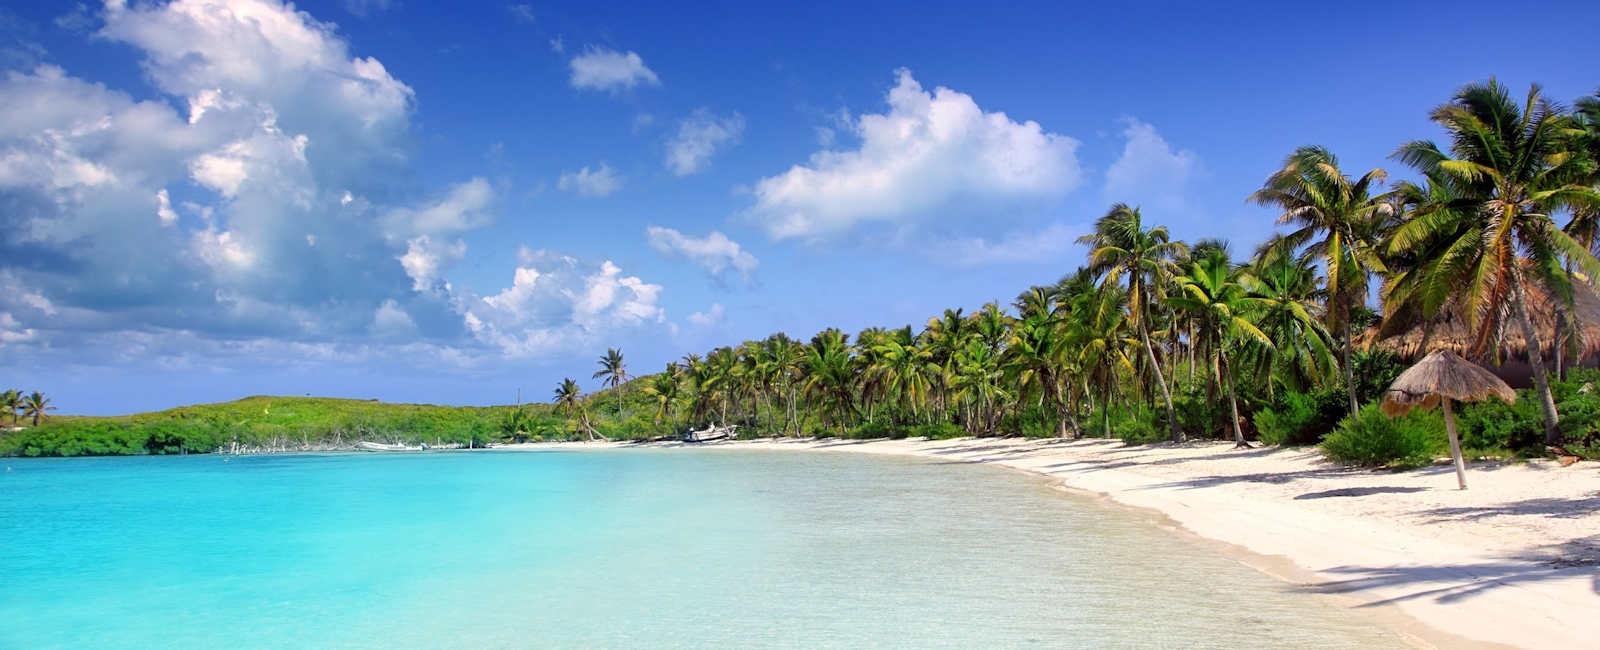 Luxury Cancun Holidays